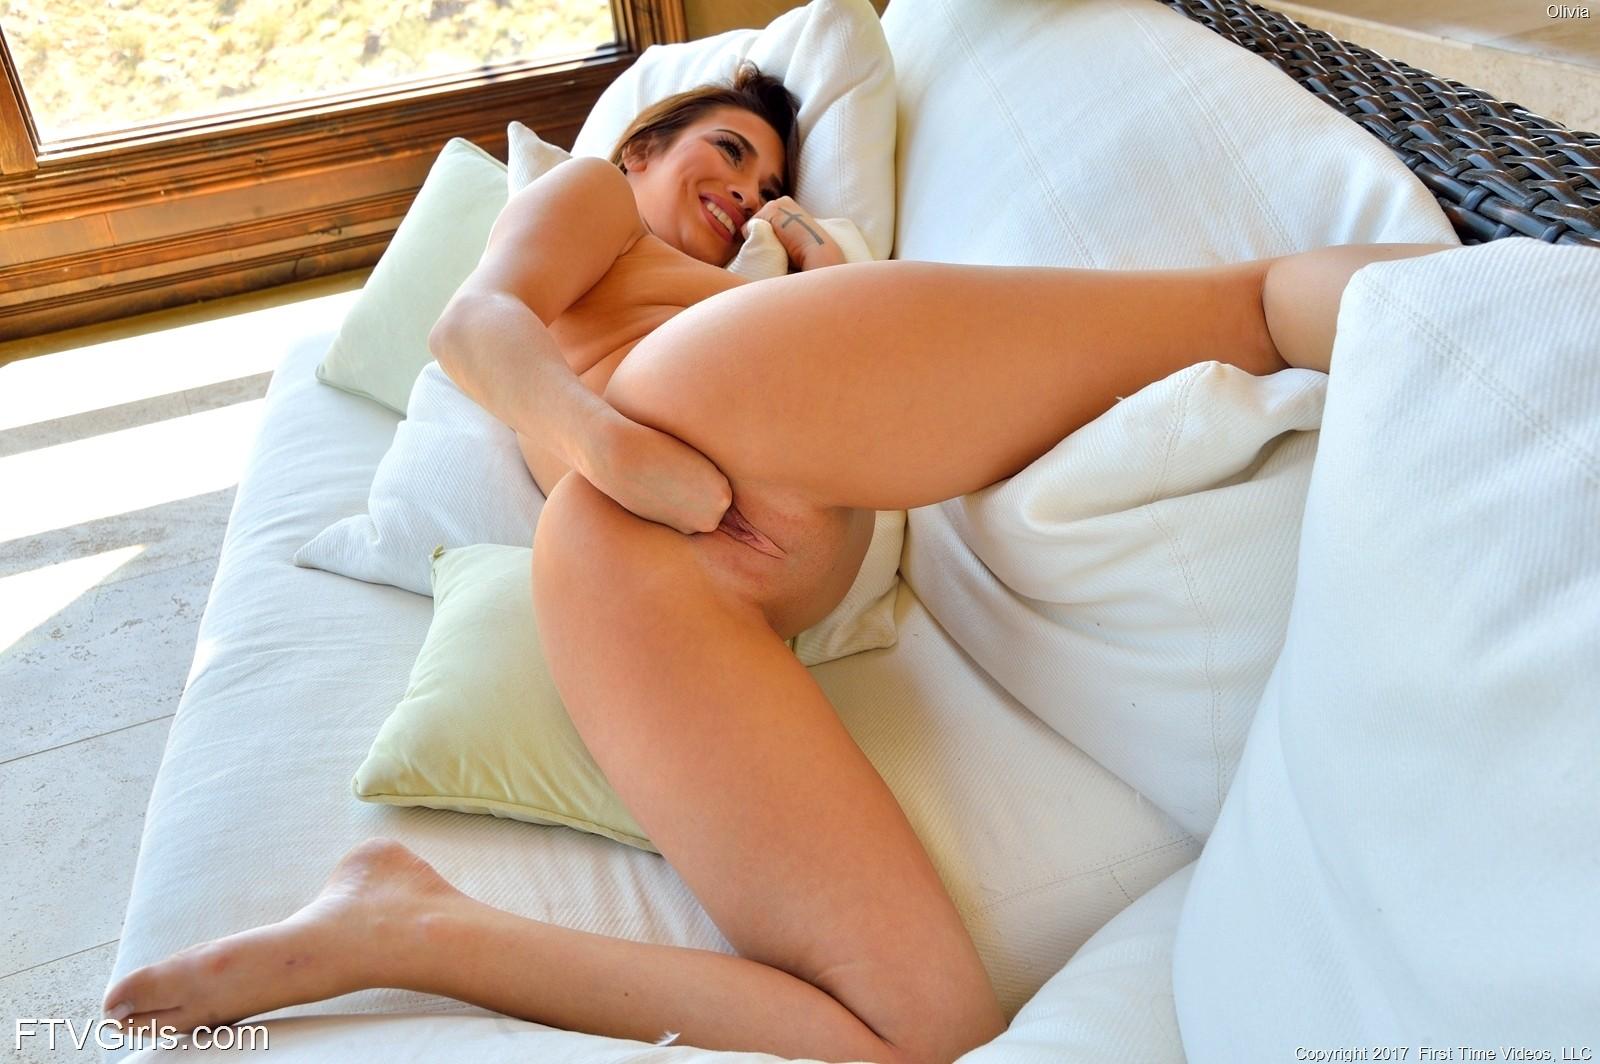 Brunette stepmom olivia nova in stockings fucks while husband away 3